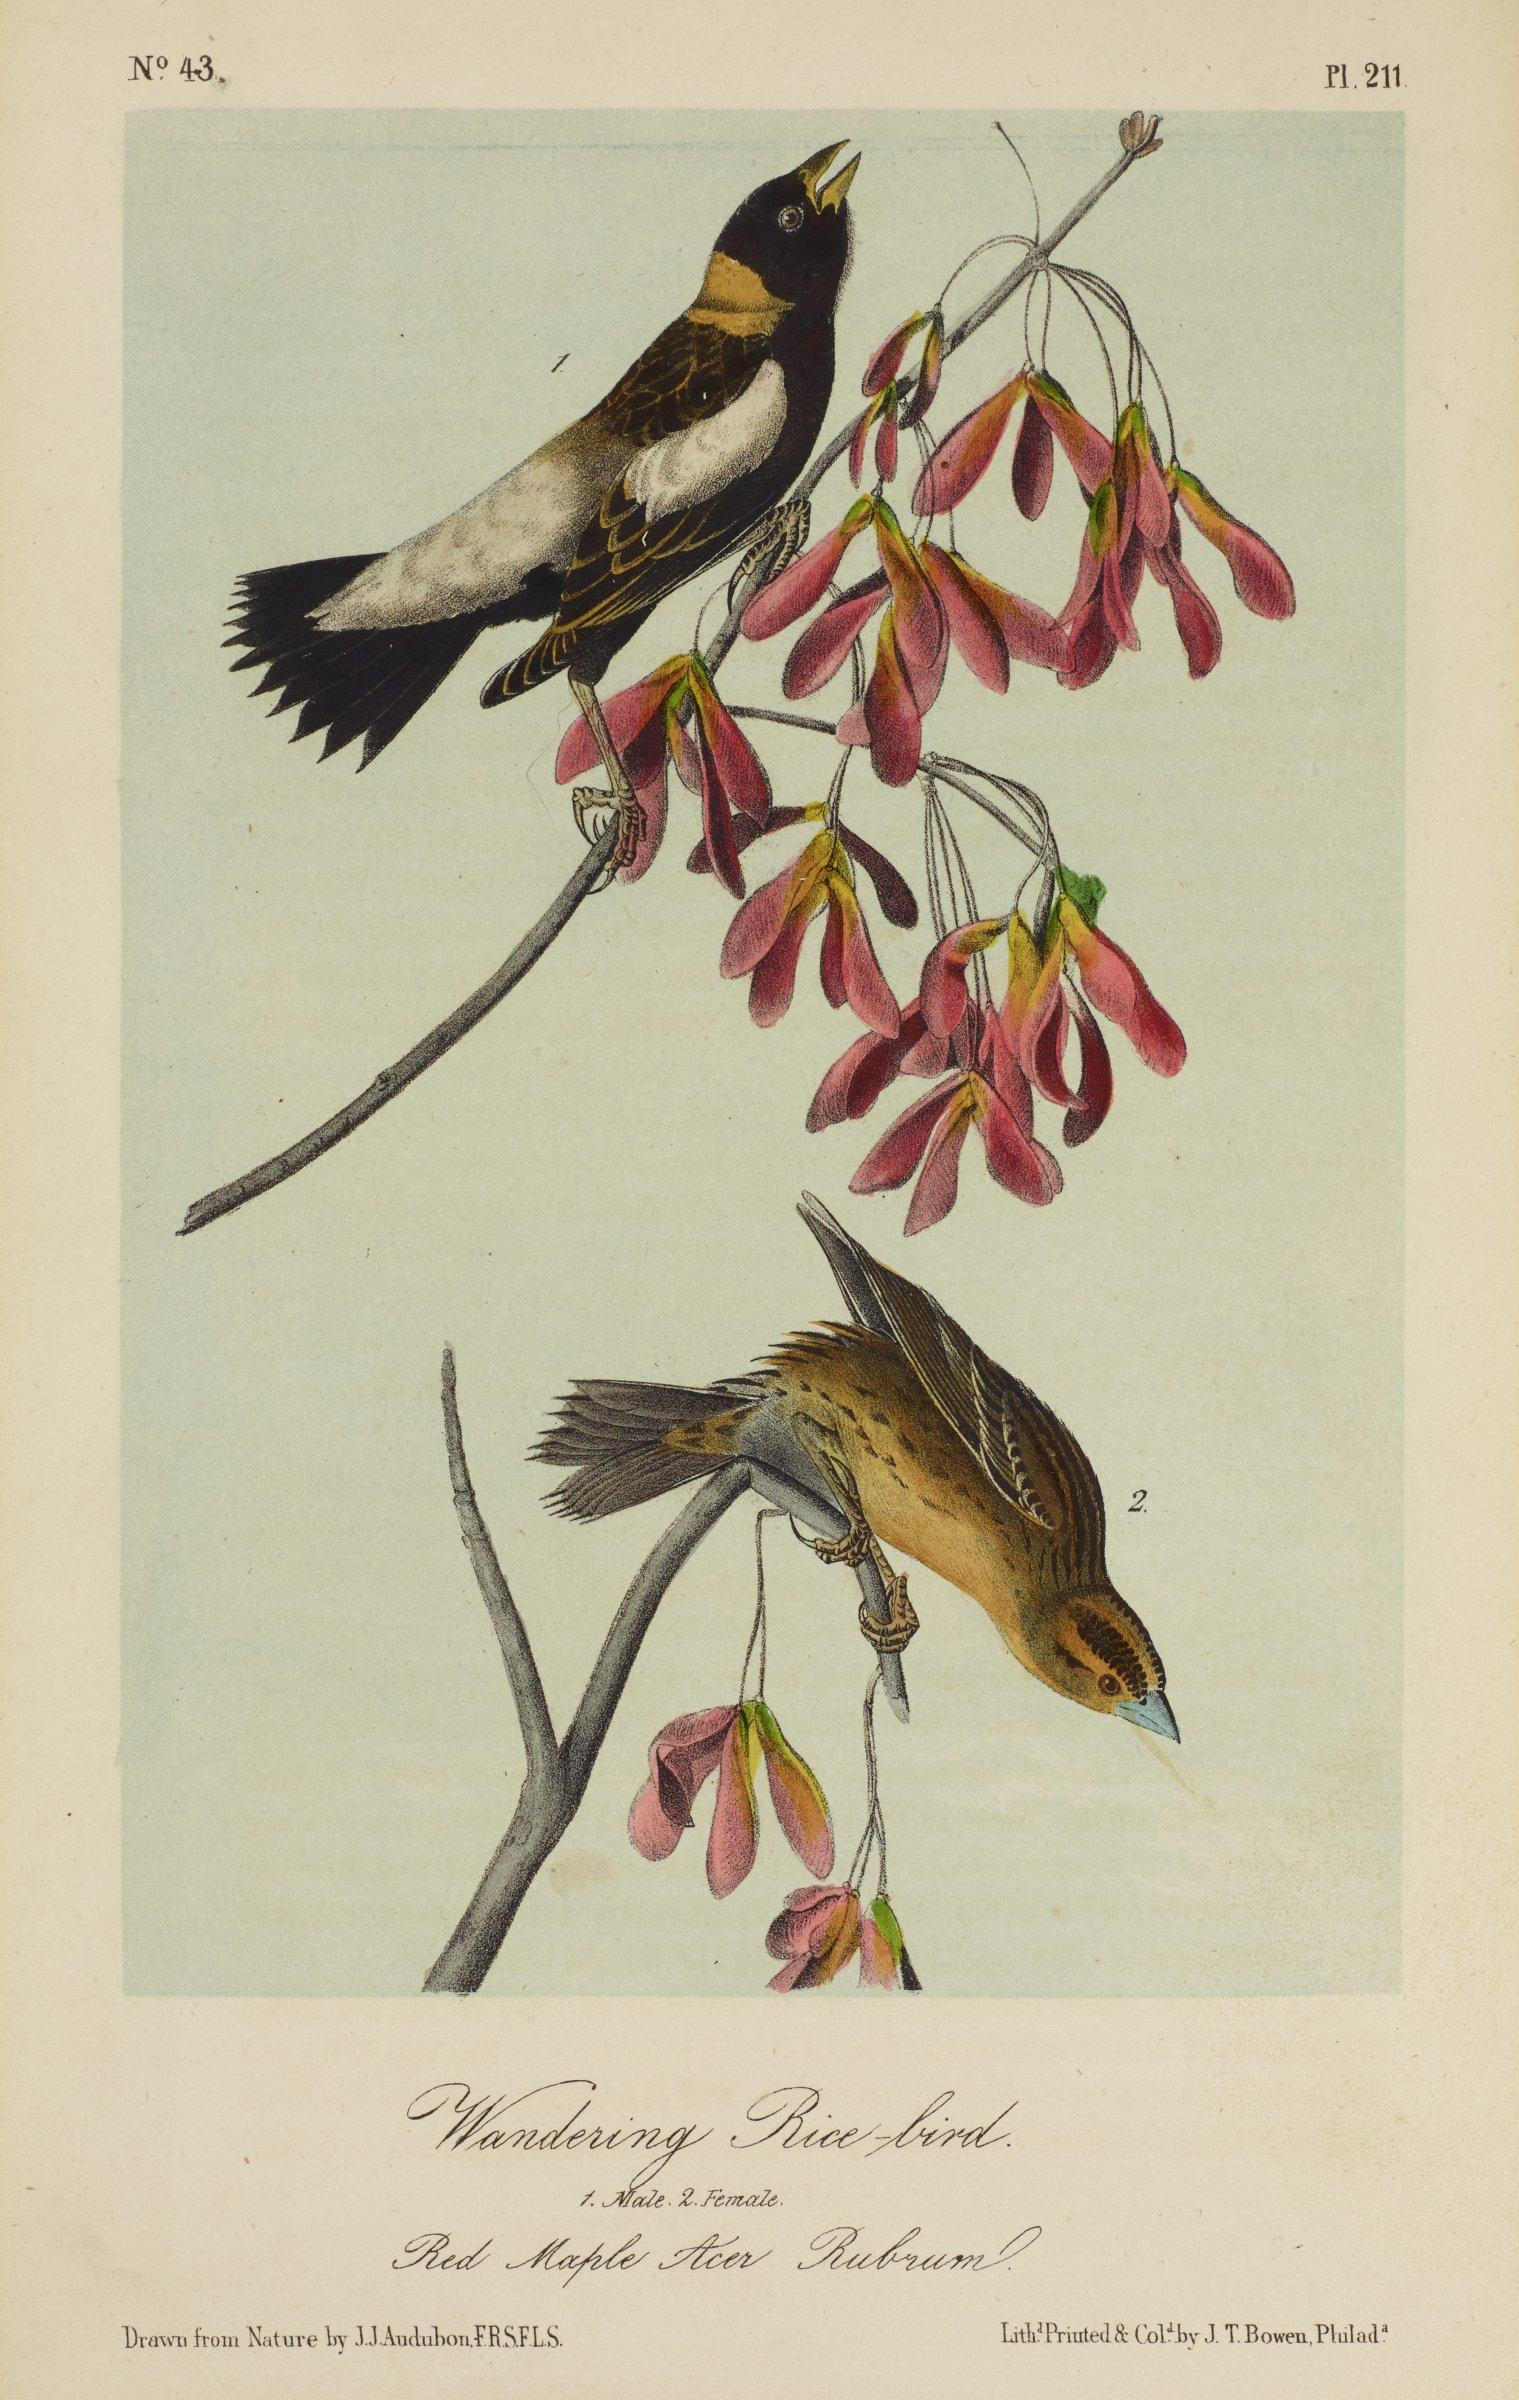 Wandering Rice-bird, John James Audubon, Printed by John T. Bowen, Philadelphia, Pennsylvania, lithography with watercolor (hand coloring)